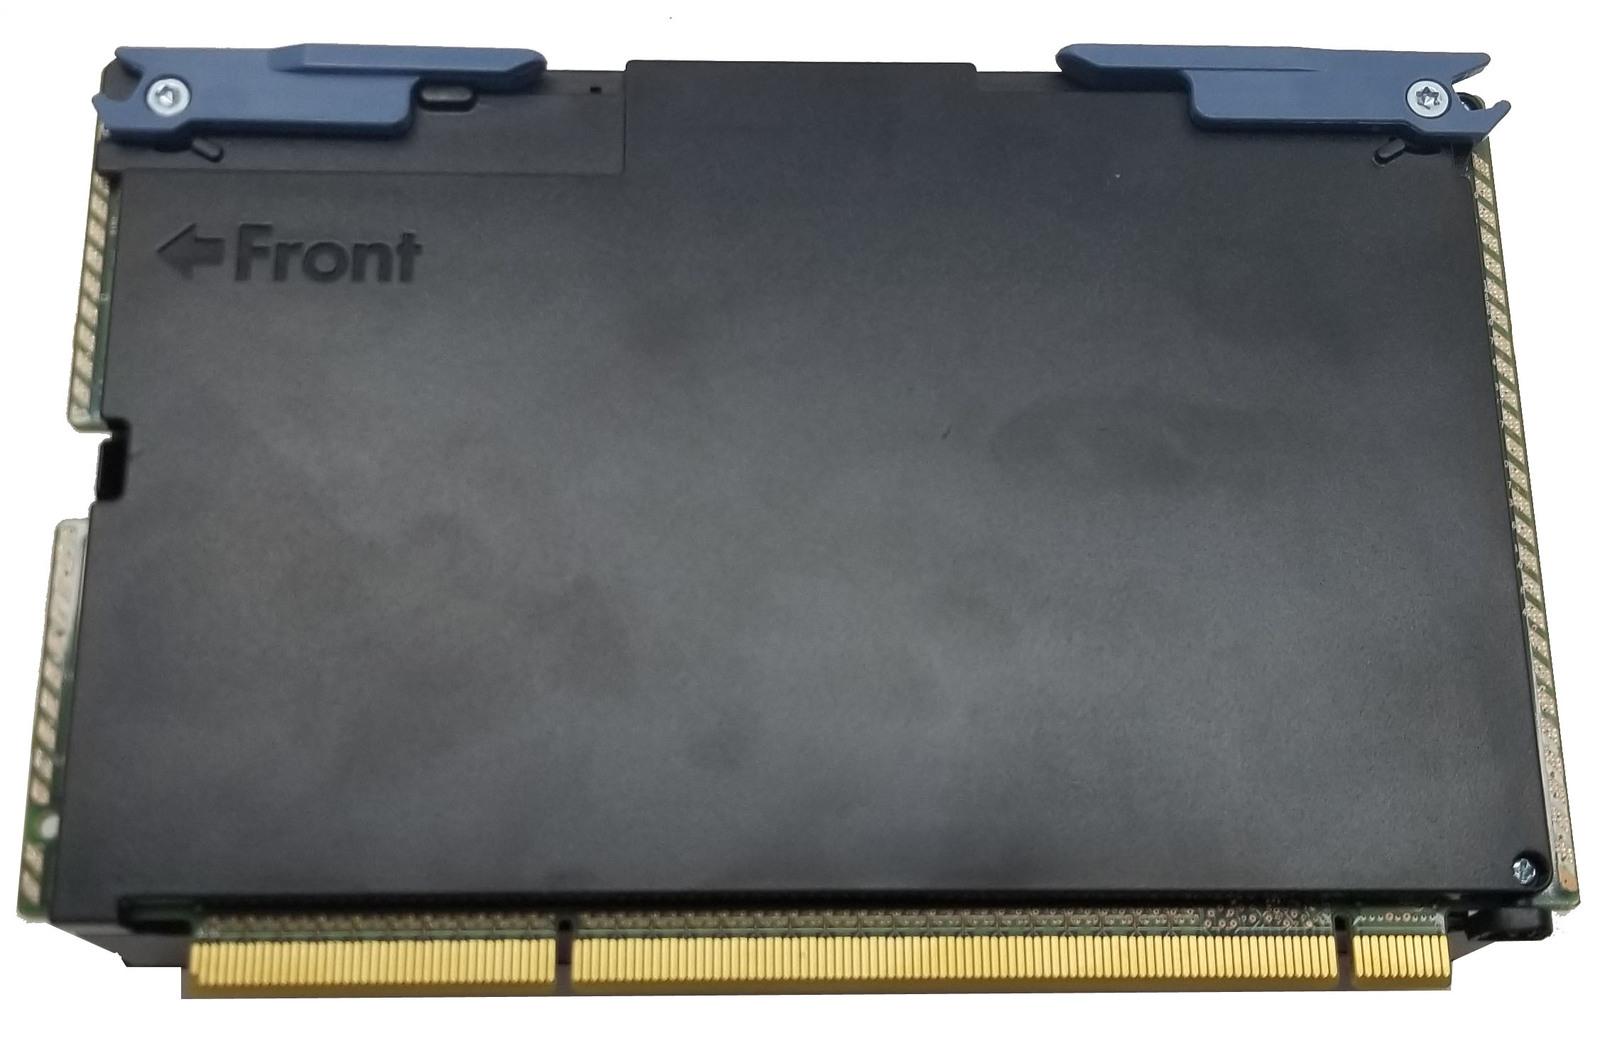 HP (Xeon E7) Memory Cartridge With 6x8=48GB RAM Kingston KTH-PL313/8G Bin:1